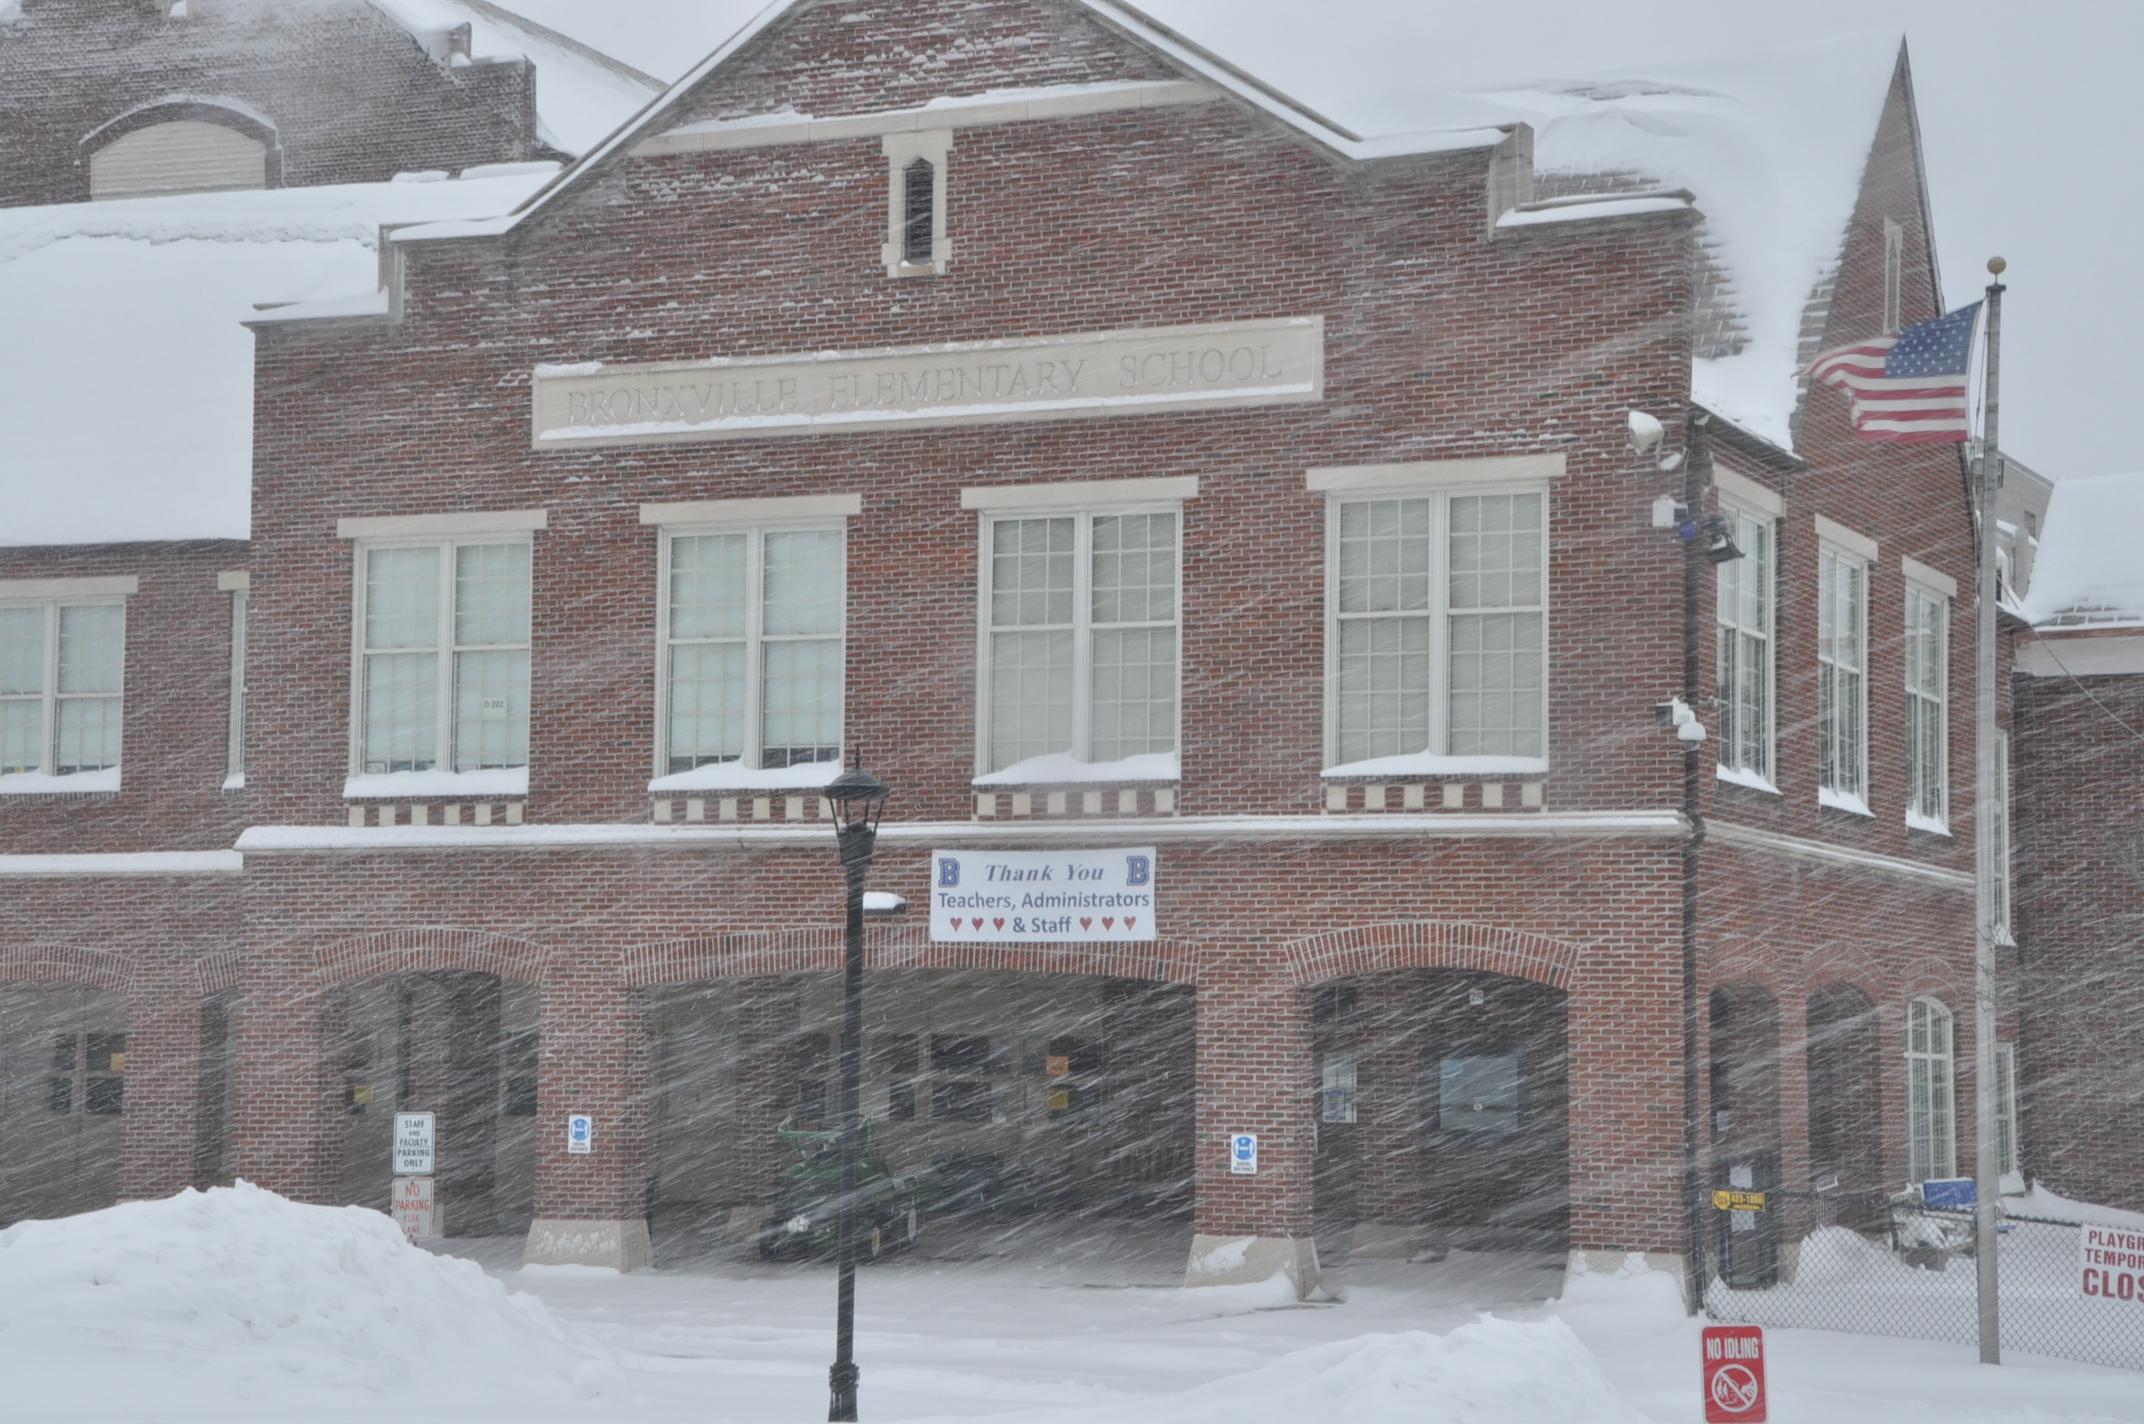 The Bronxville School